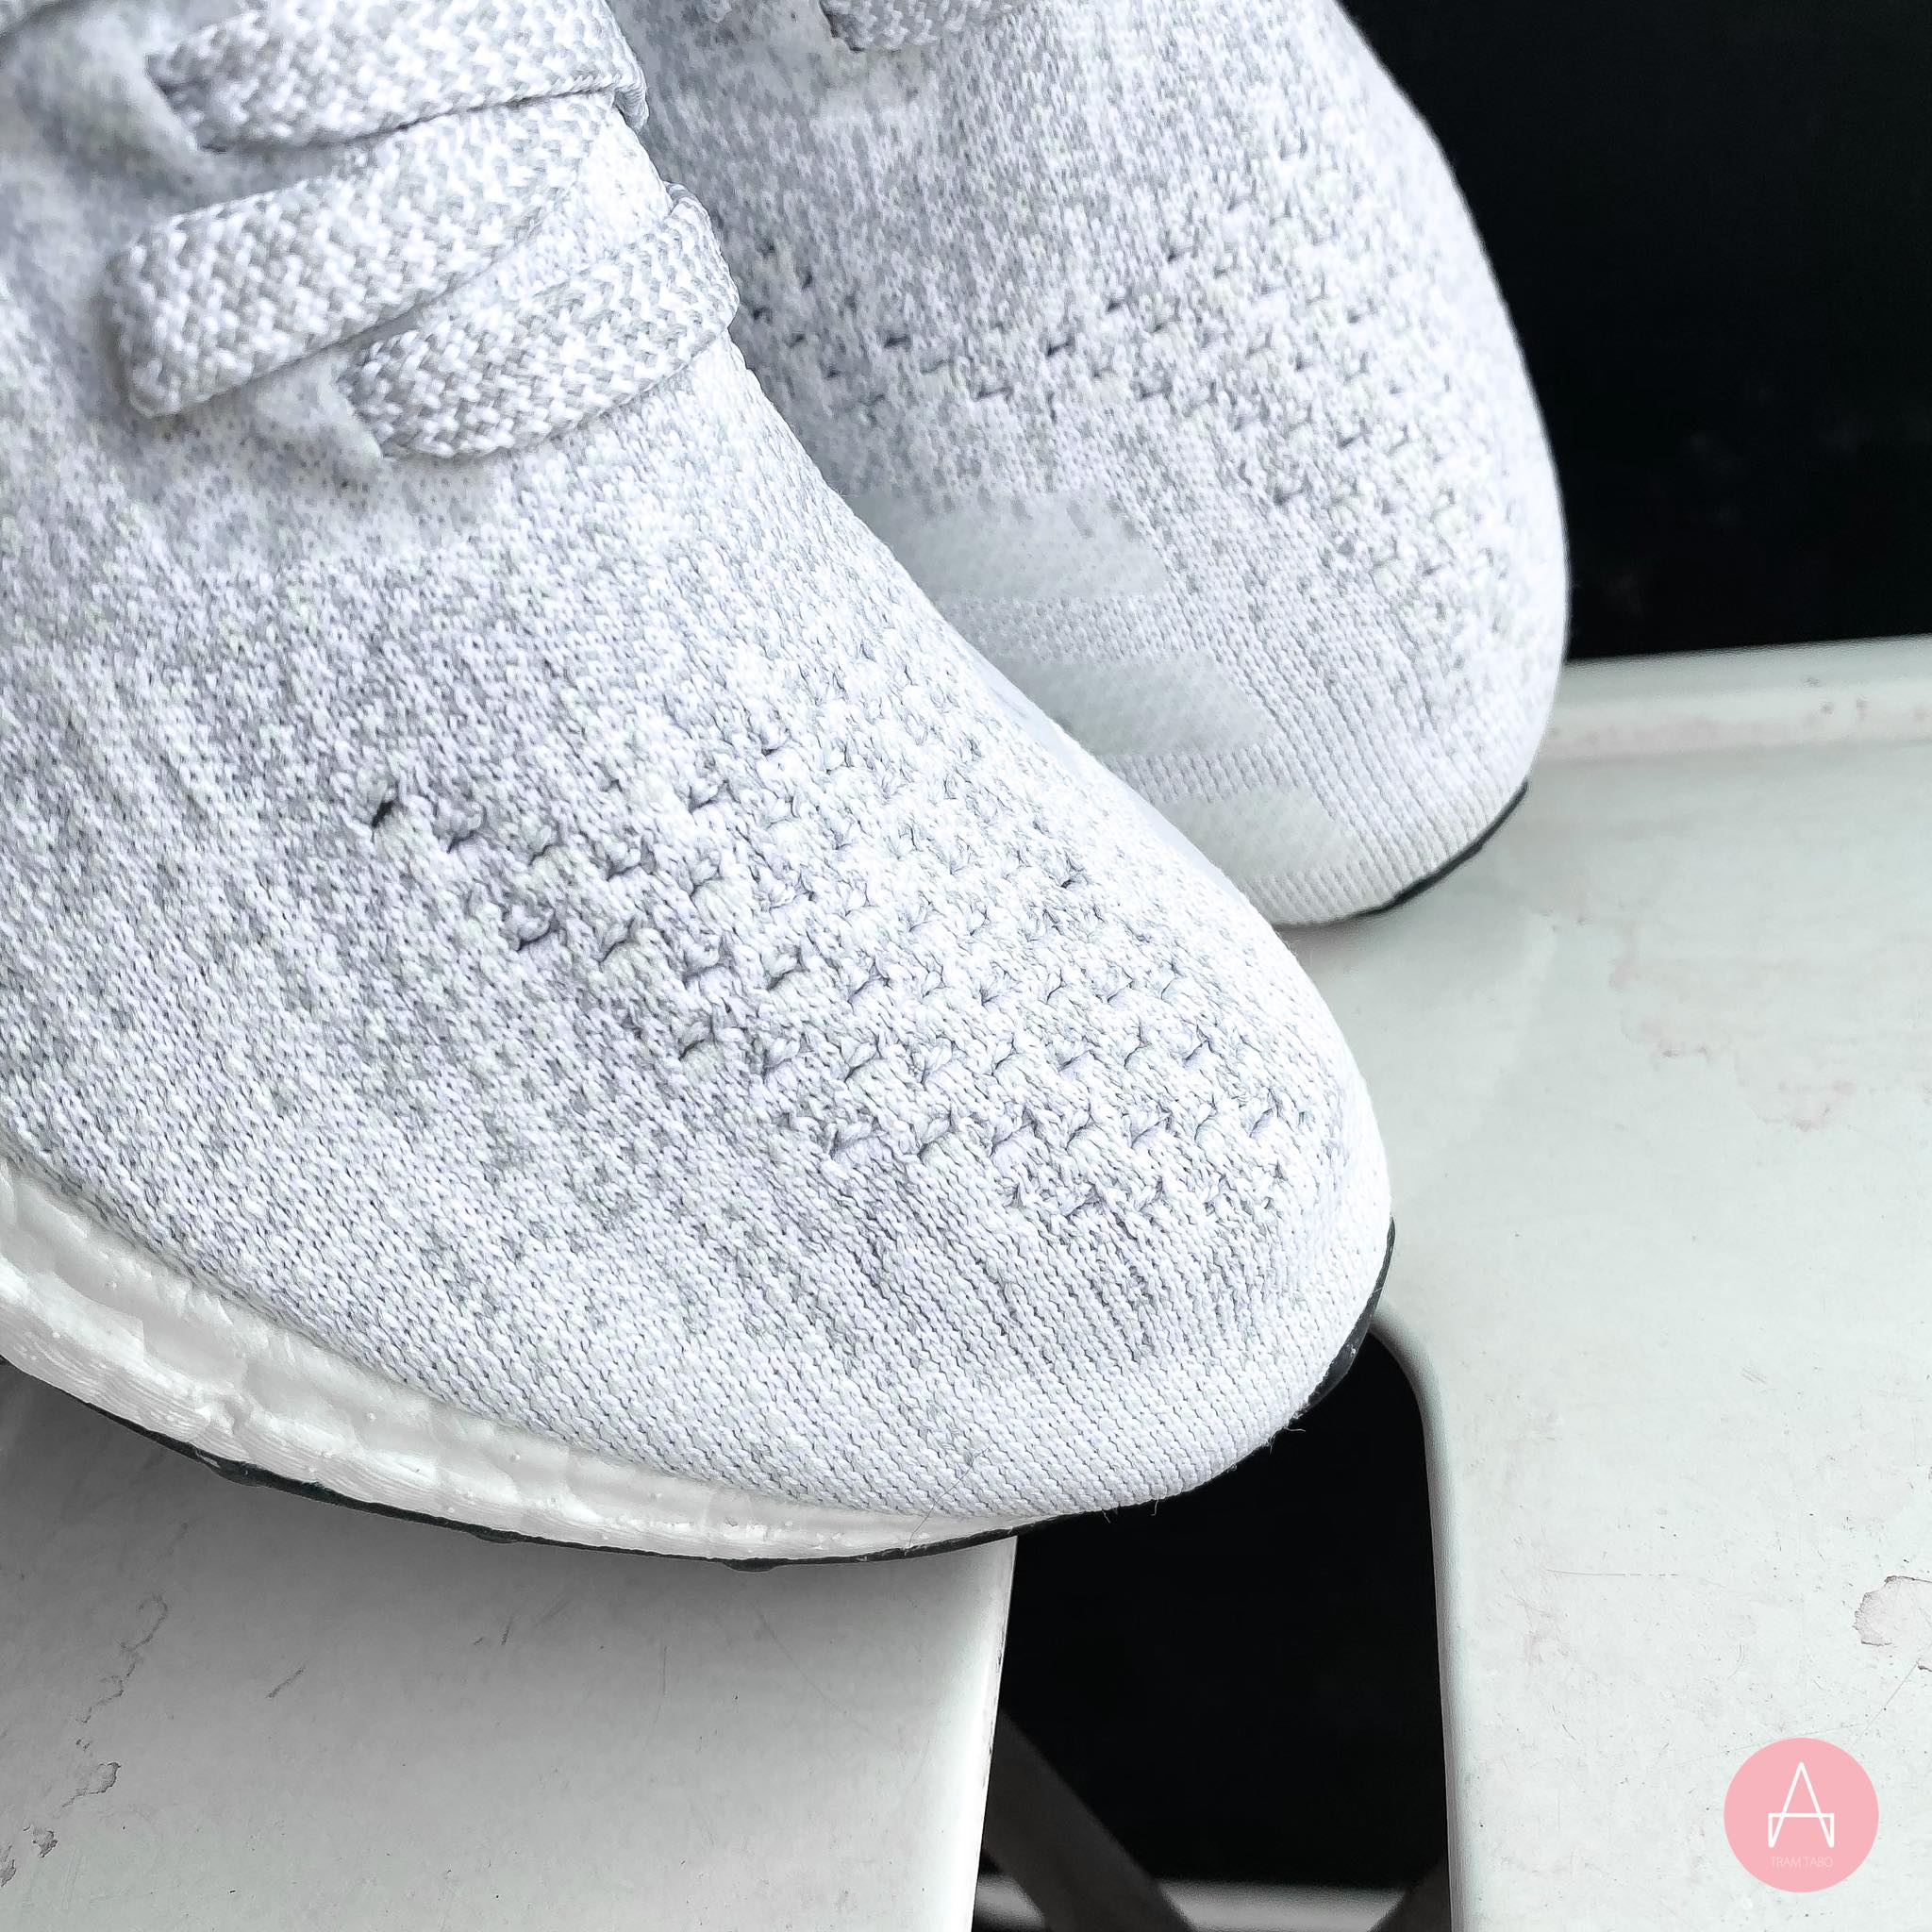 [DA9157] M ADIDAS ULTRABOOST UNCAGED WHITE TINT